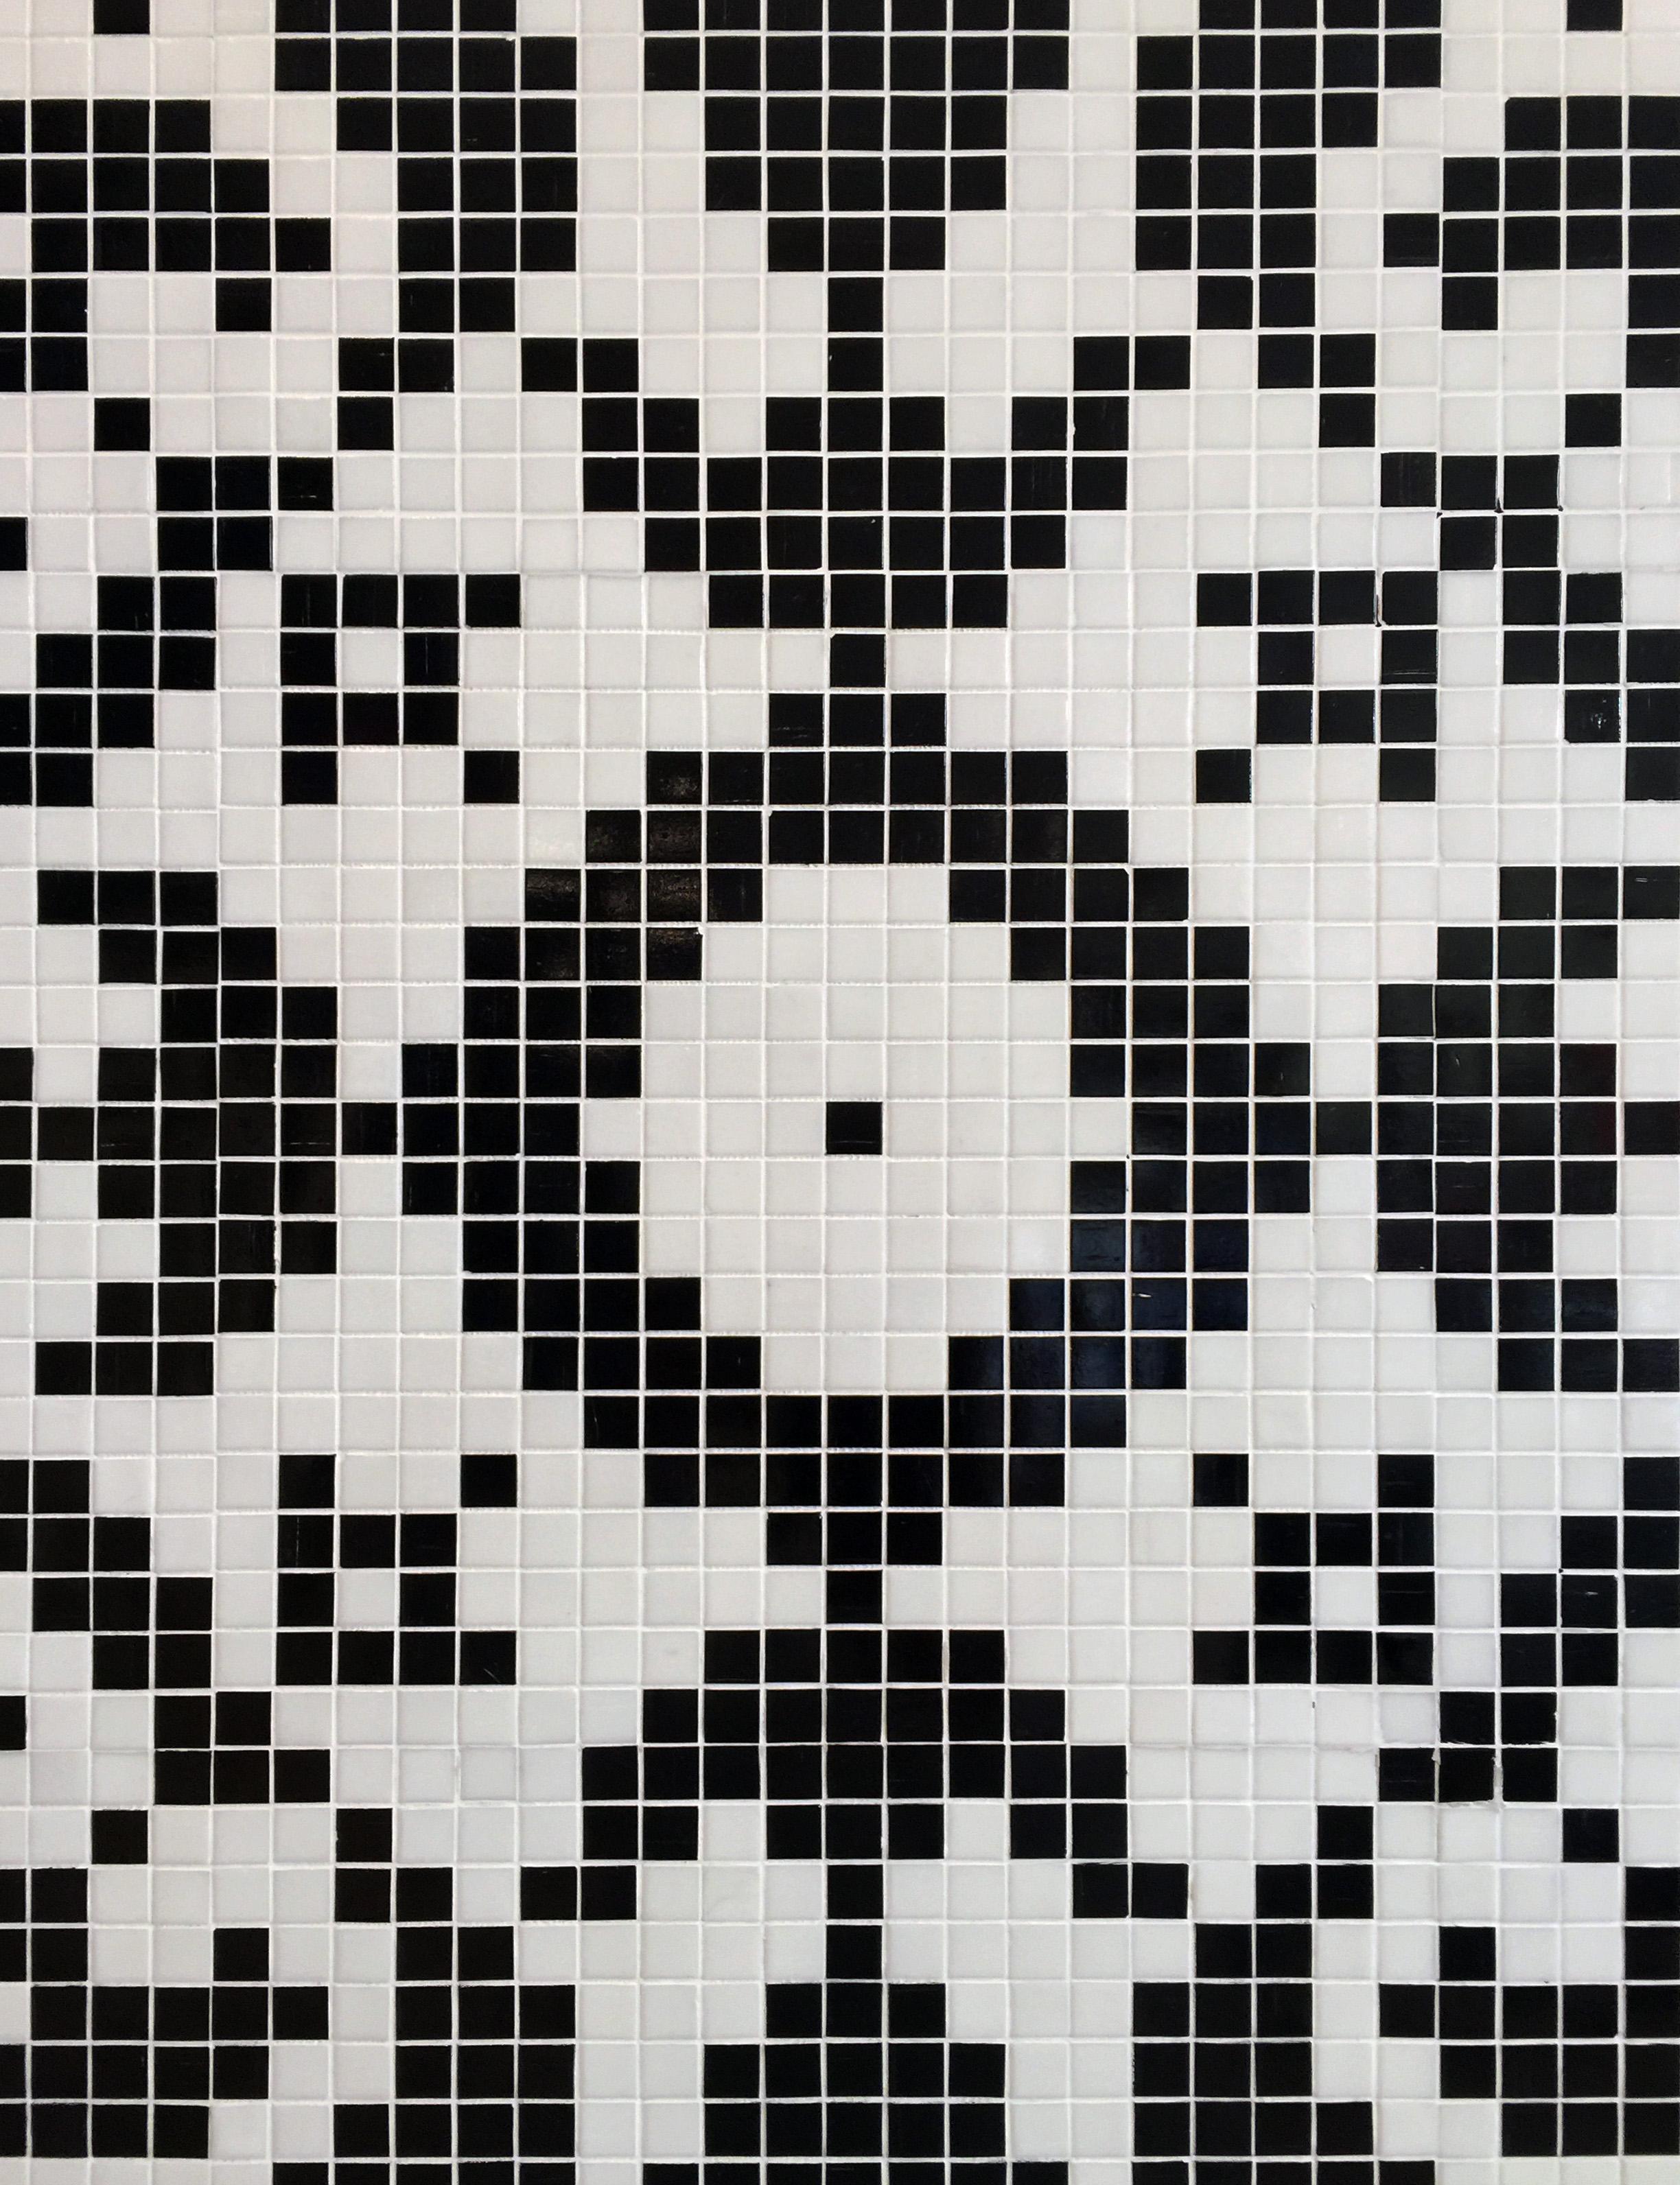 https commons wikimedia org wiki file black and white tile mosaic jpg